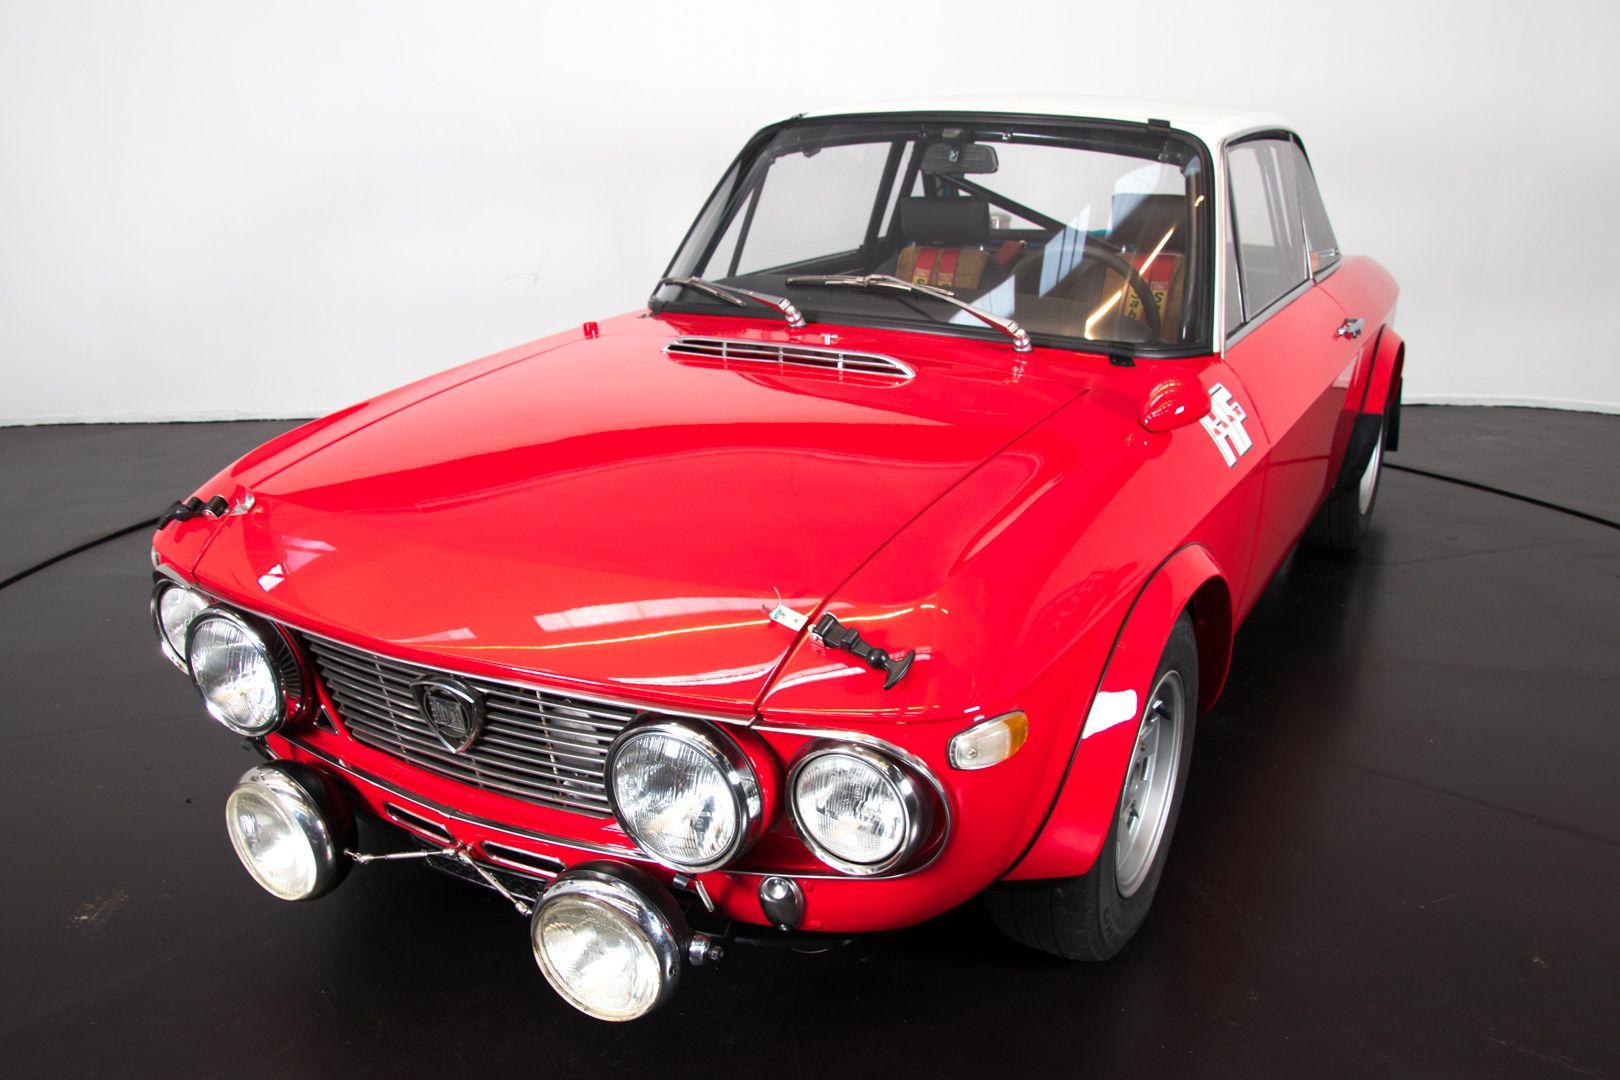 1970 Lancia Fulvia HF 1.6 - Gruppo 4 18806